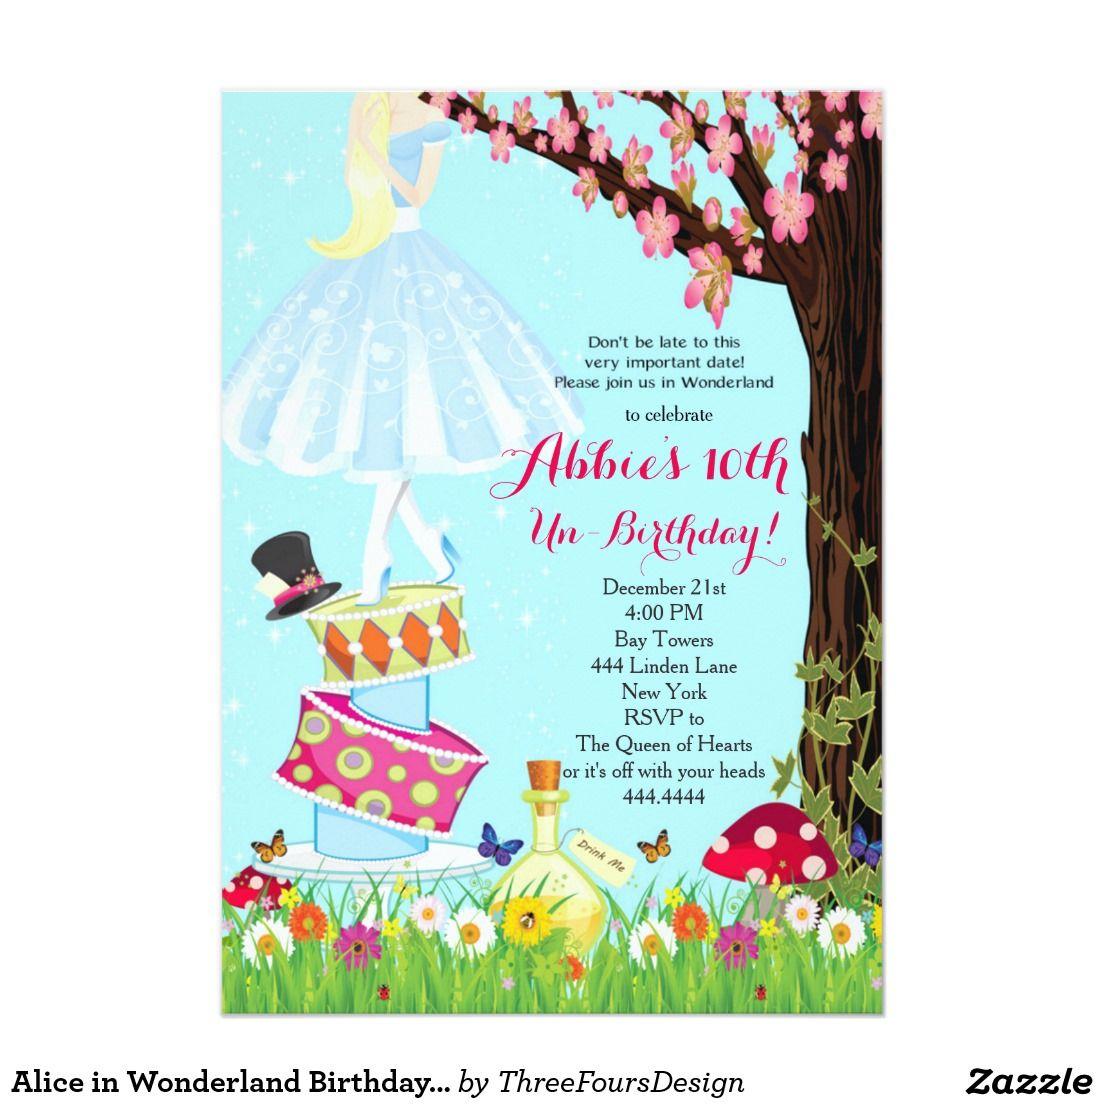 Alice In Wonderland Birthday Invitations Zazzle Com Alice In Wonderland Invitations Alice In Wonderland Birthday Mad Hatter Tea Party Invitations